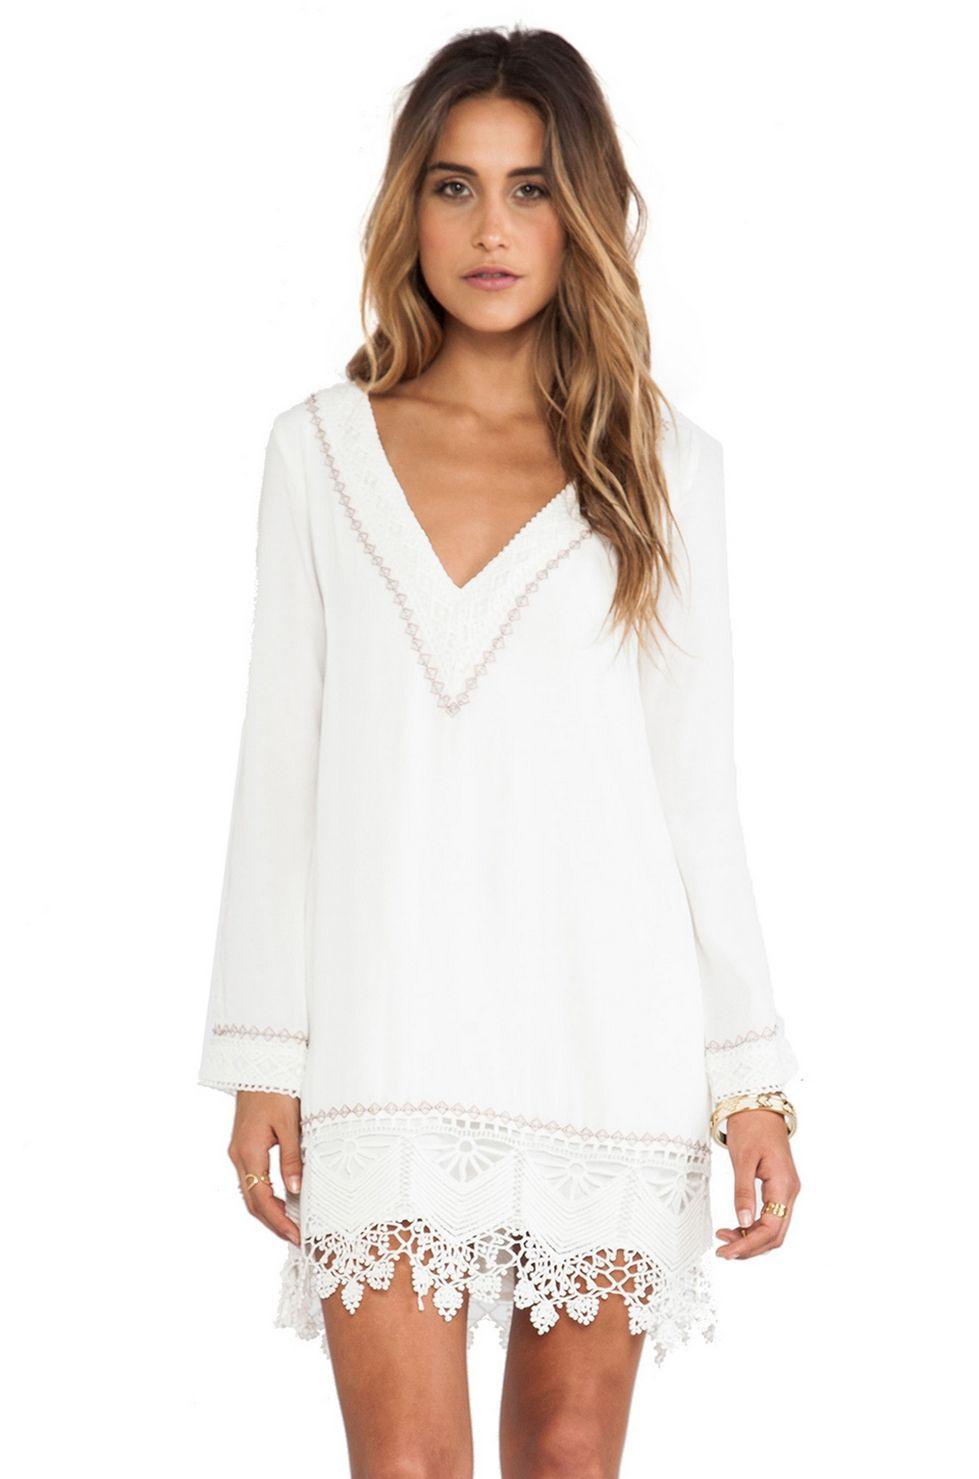 5466d504e65 150+ Beautiful Shift Dresses Fashion Suitable for Summer  https   femaline.com